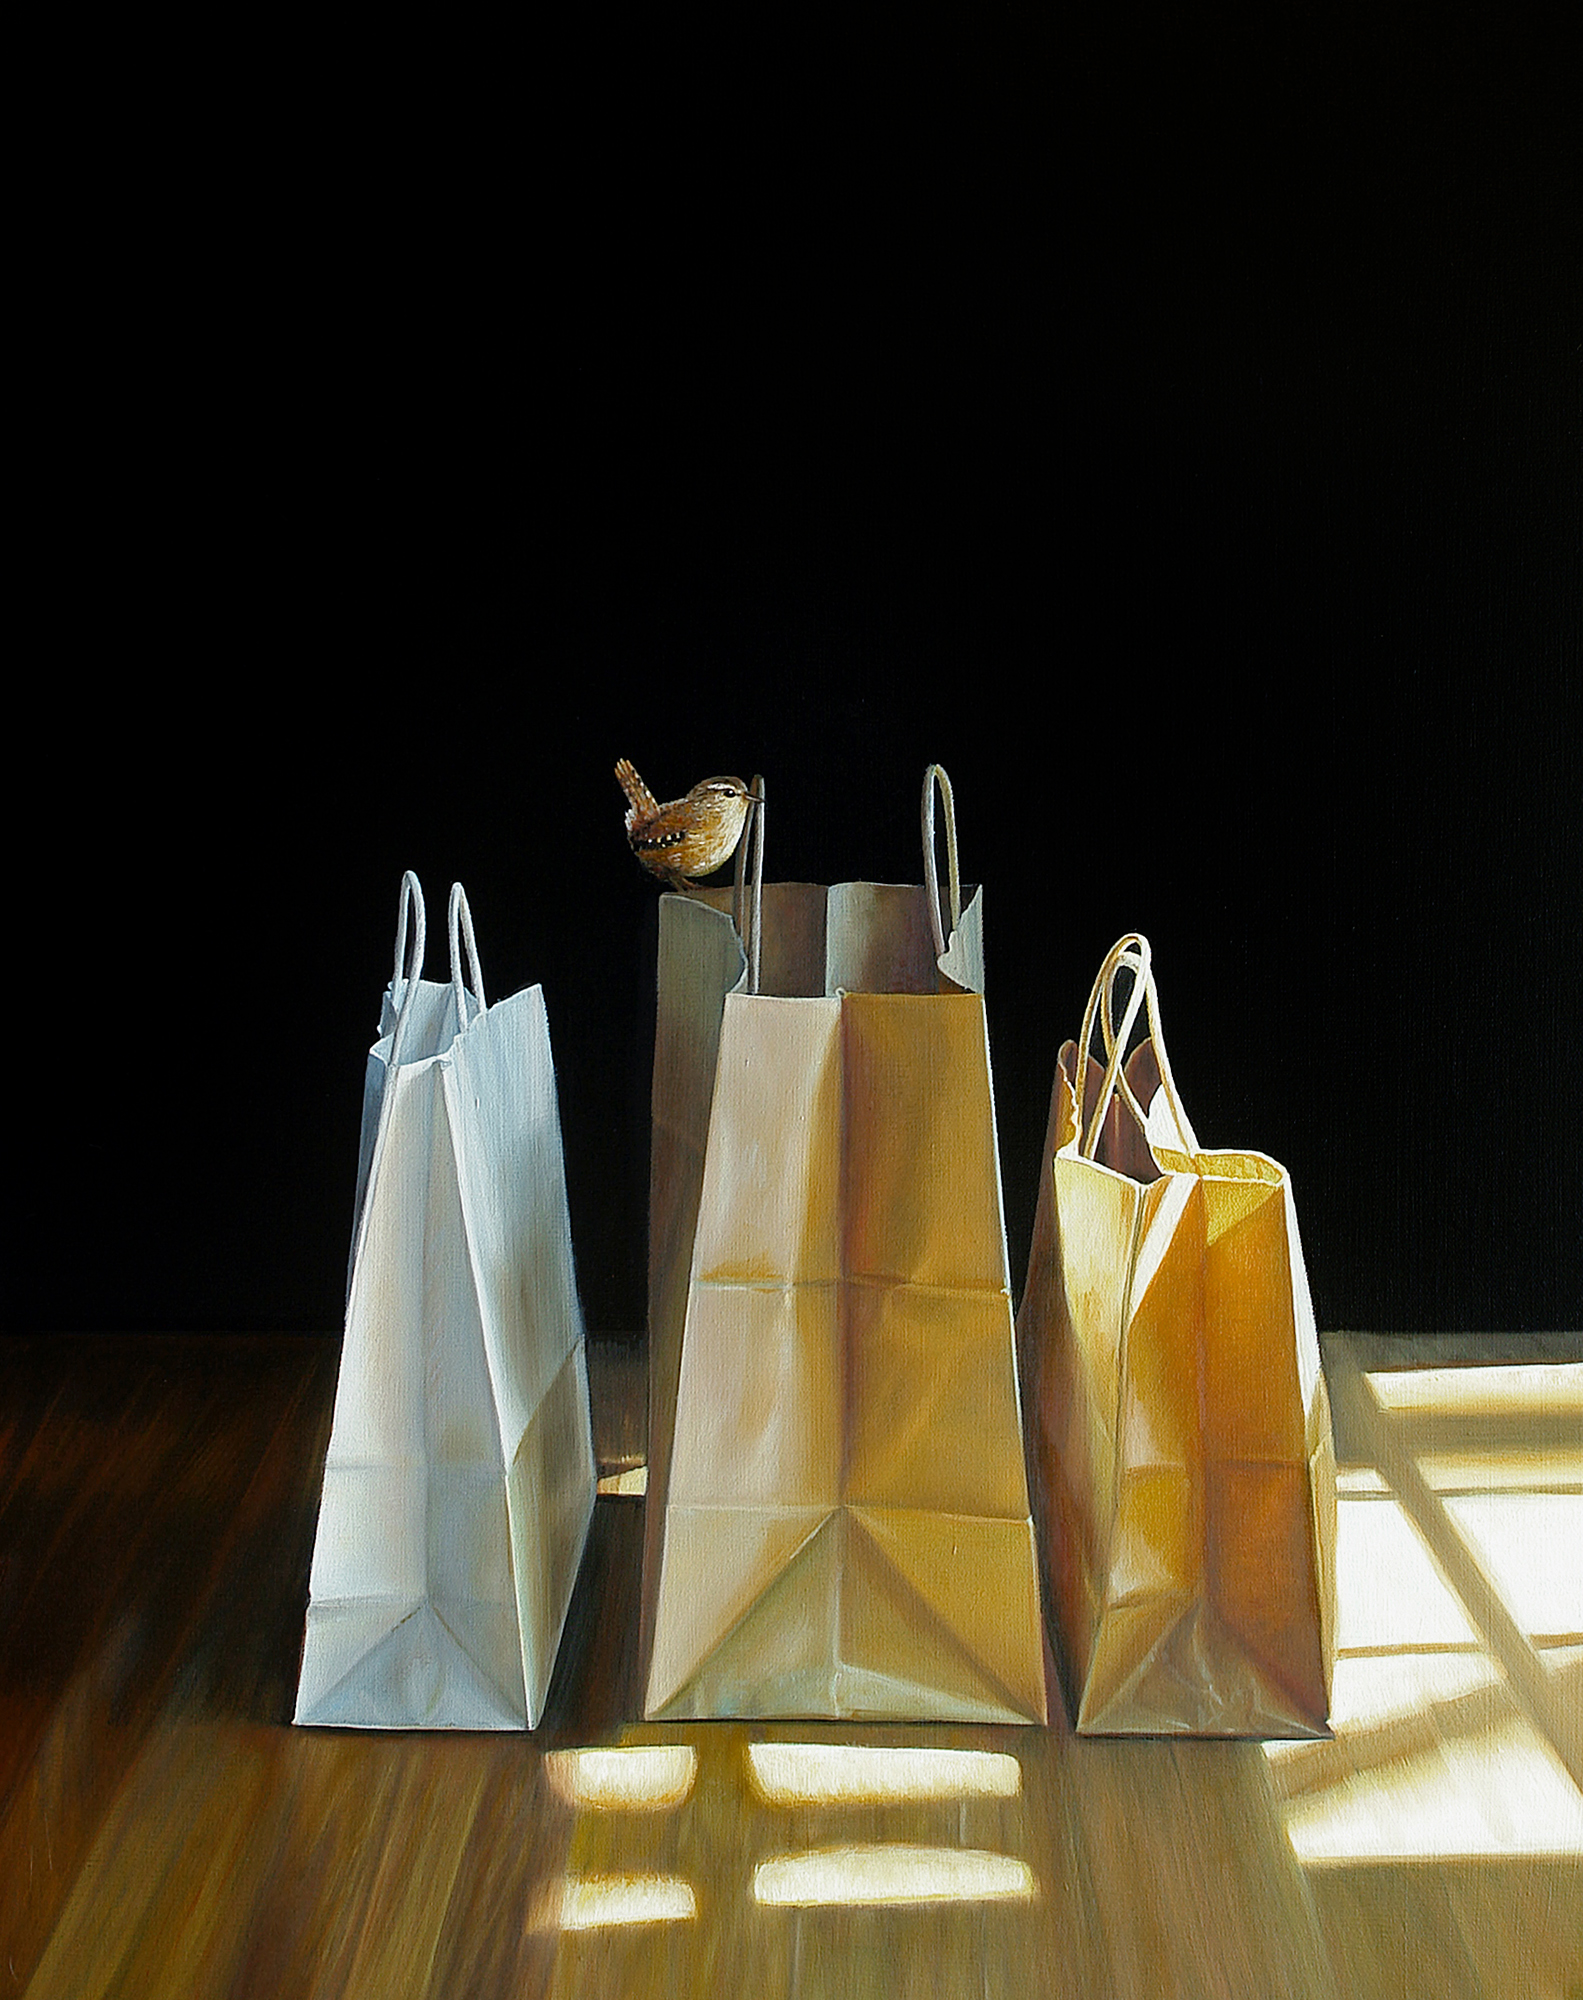 Perch | 24 x 30 | Oil on canvas